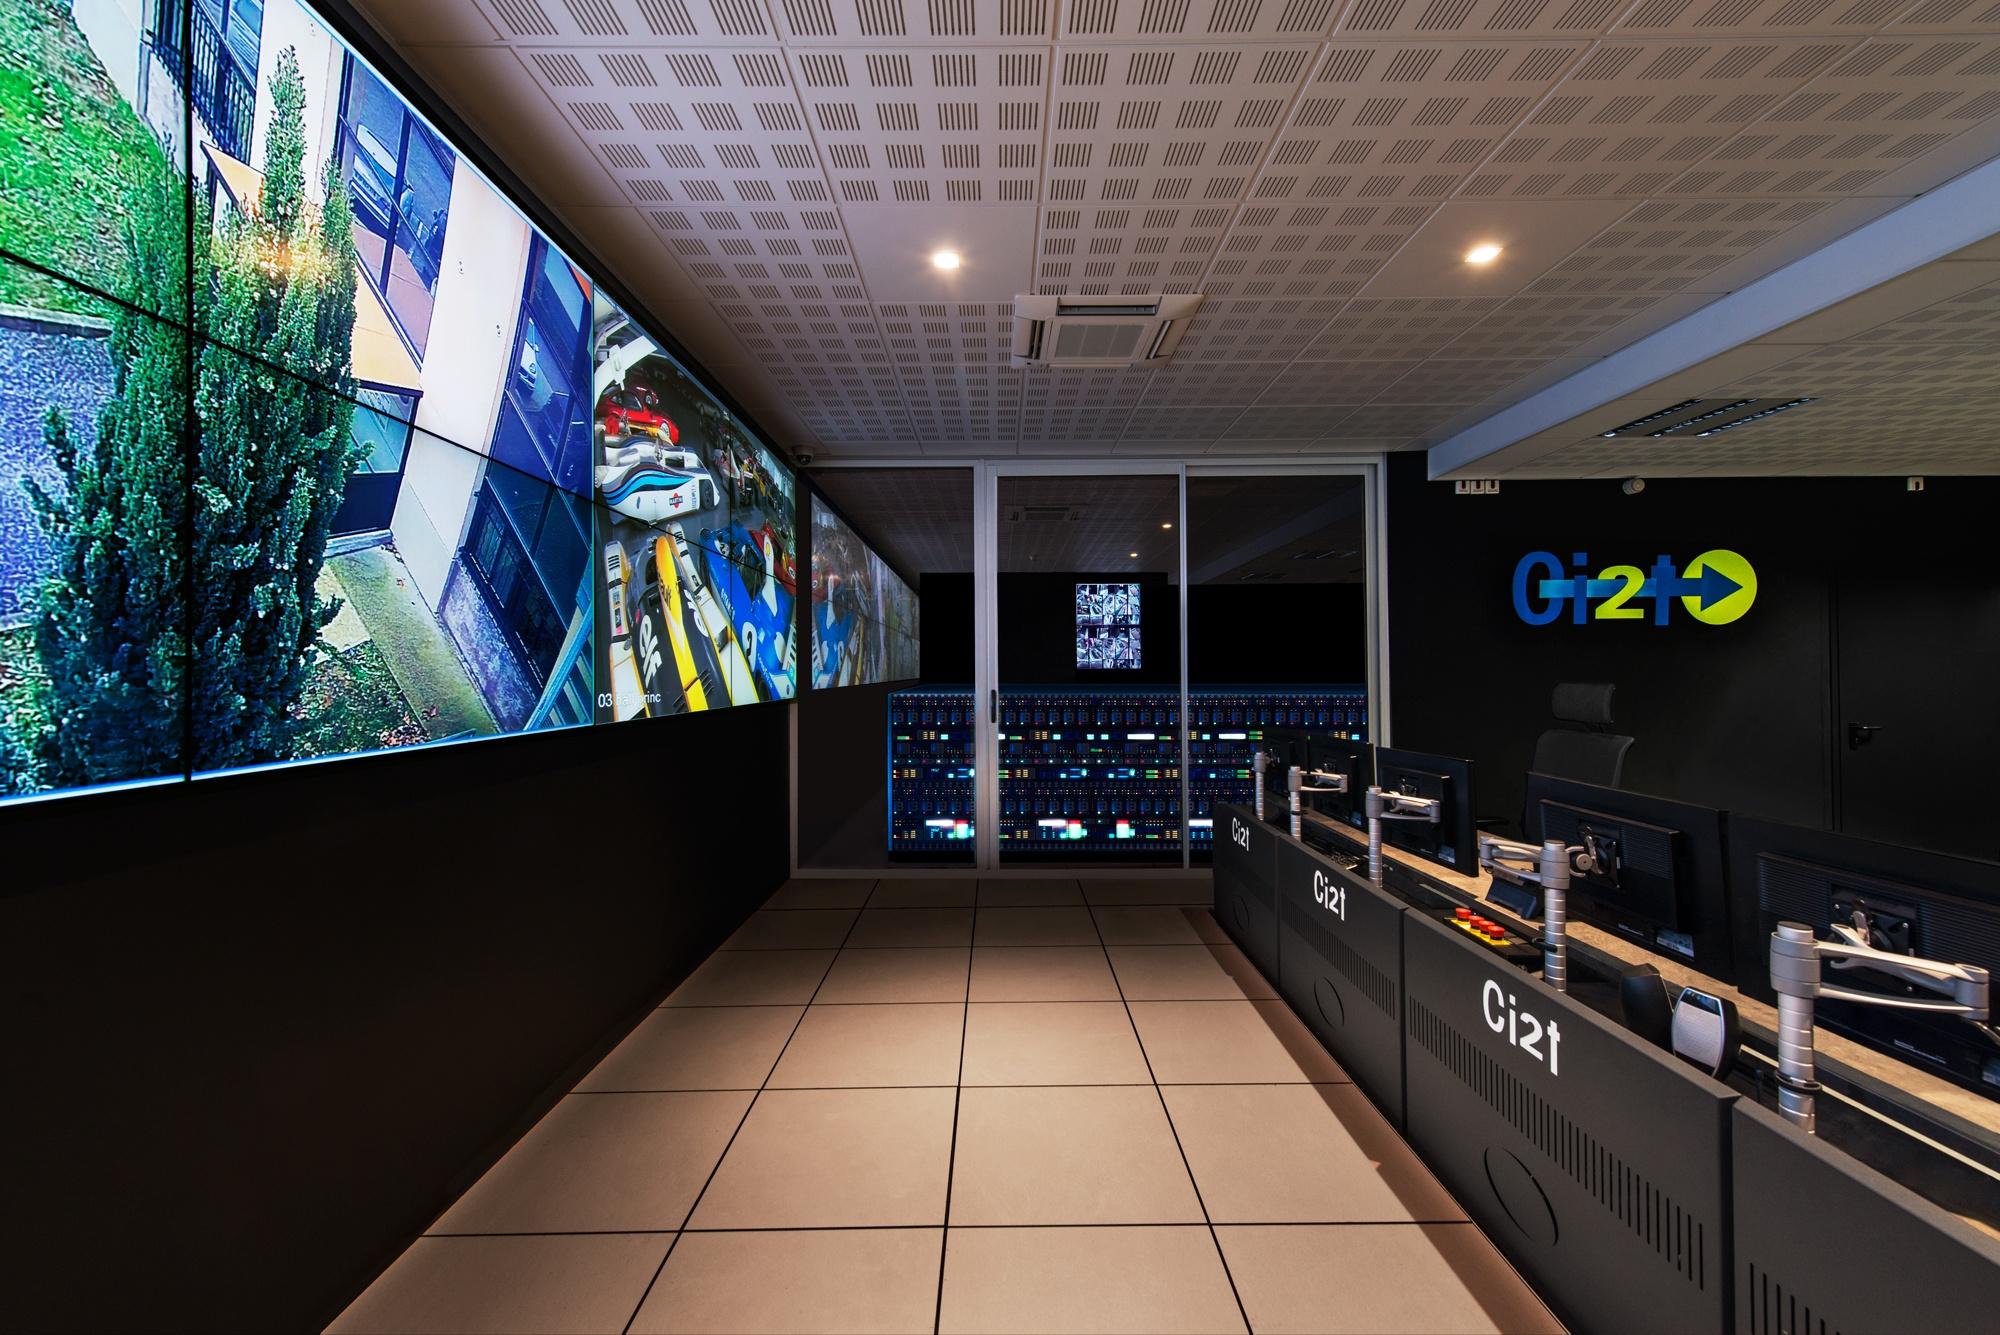 ci2t-telesurveillance-marseille-aix-en-provence